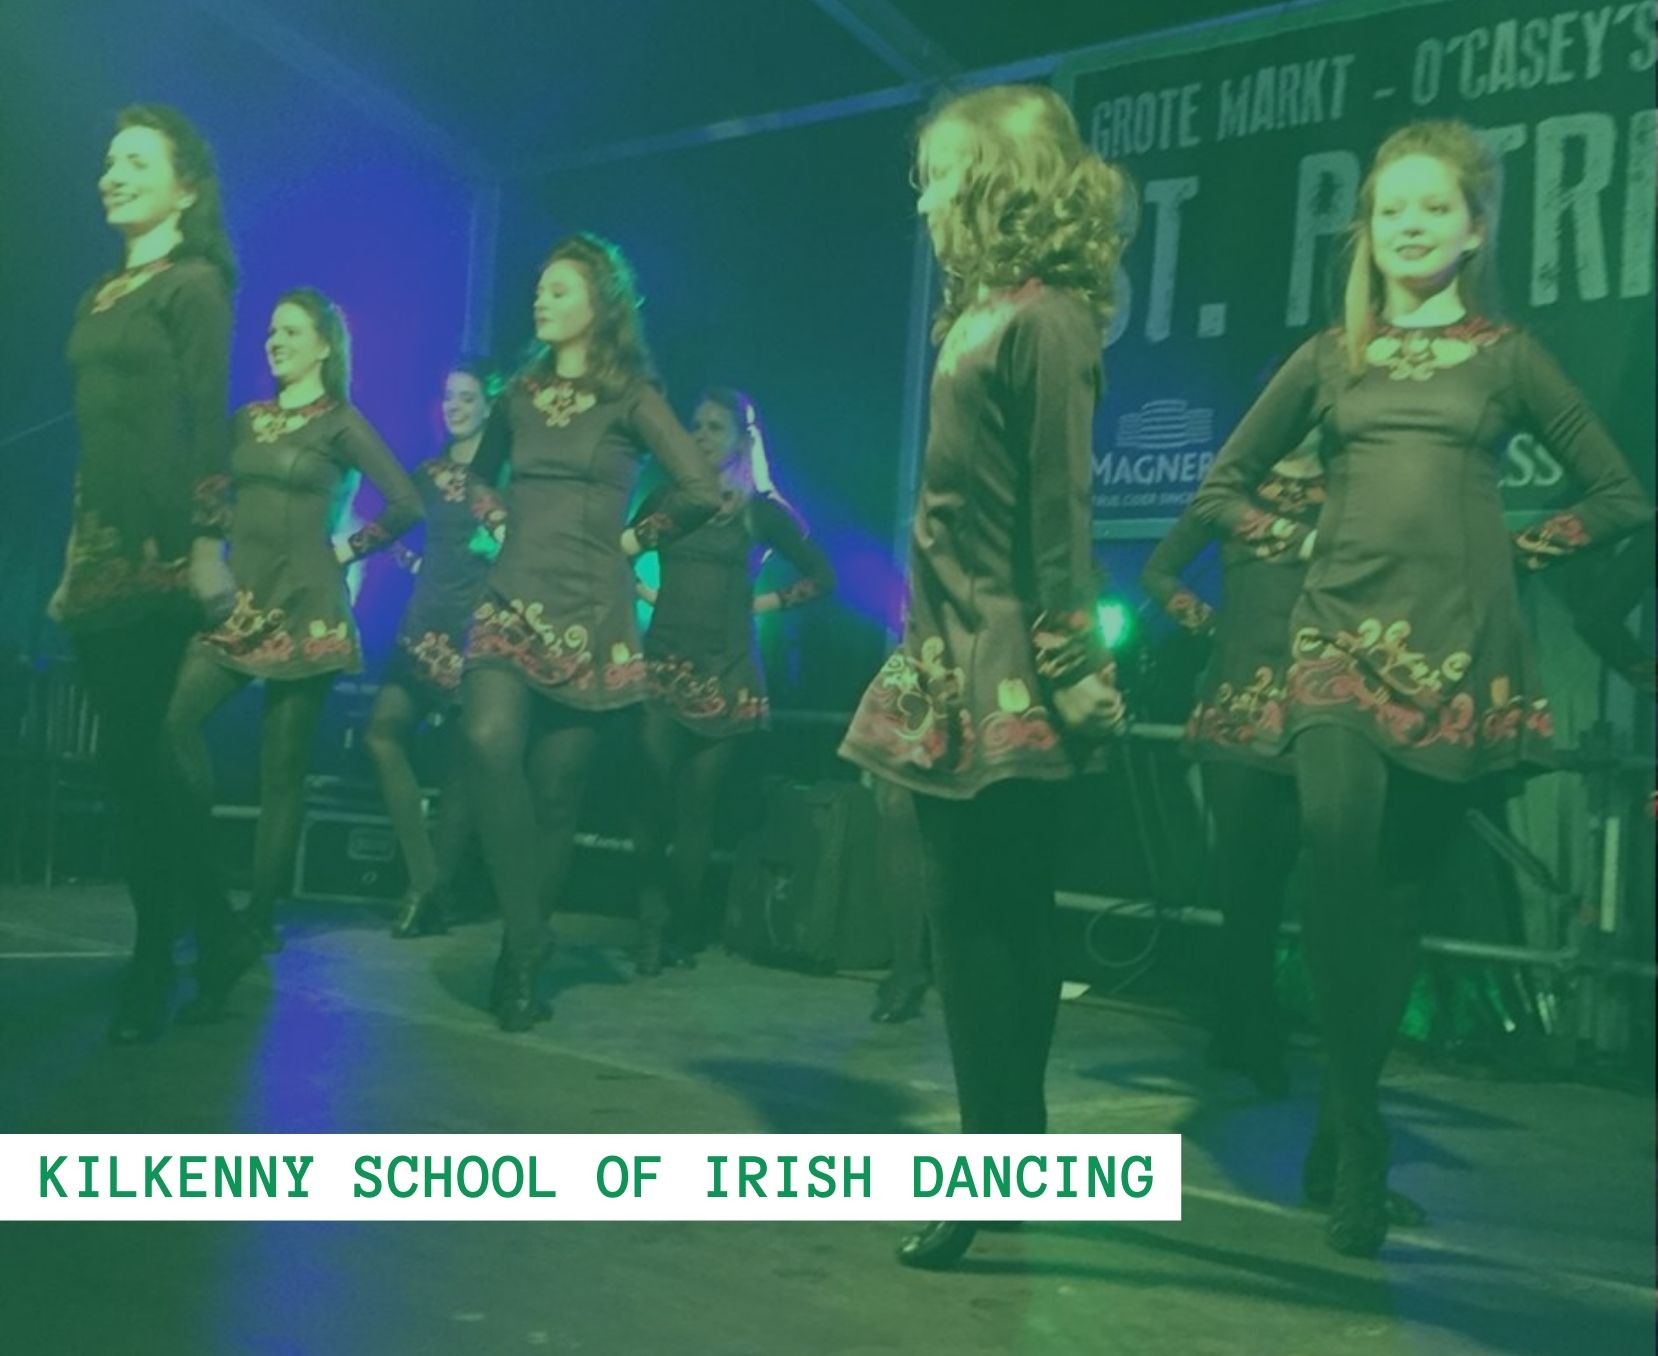 Kilkenny School of Irish Dancing - st patricks day 2020 the hague